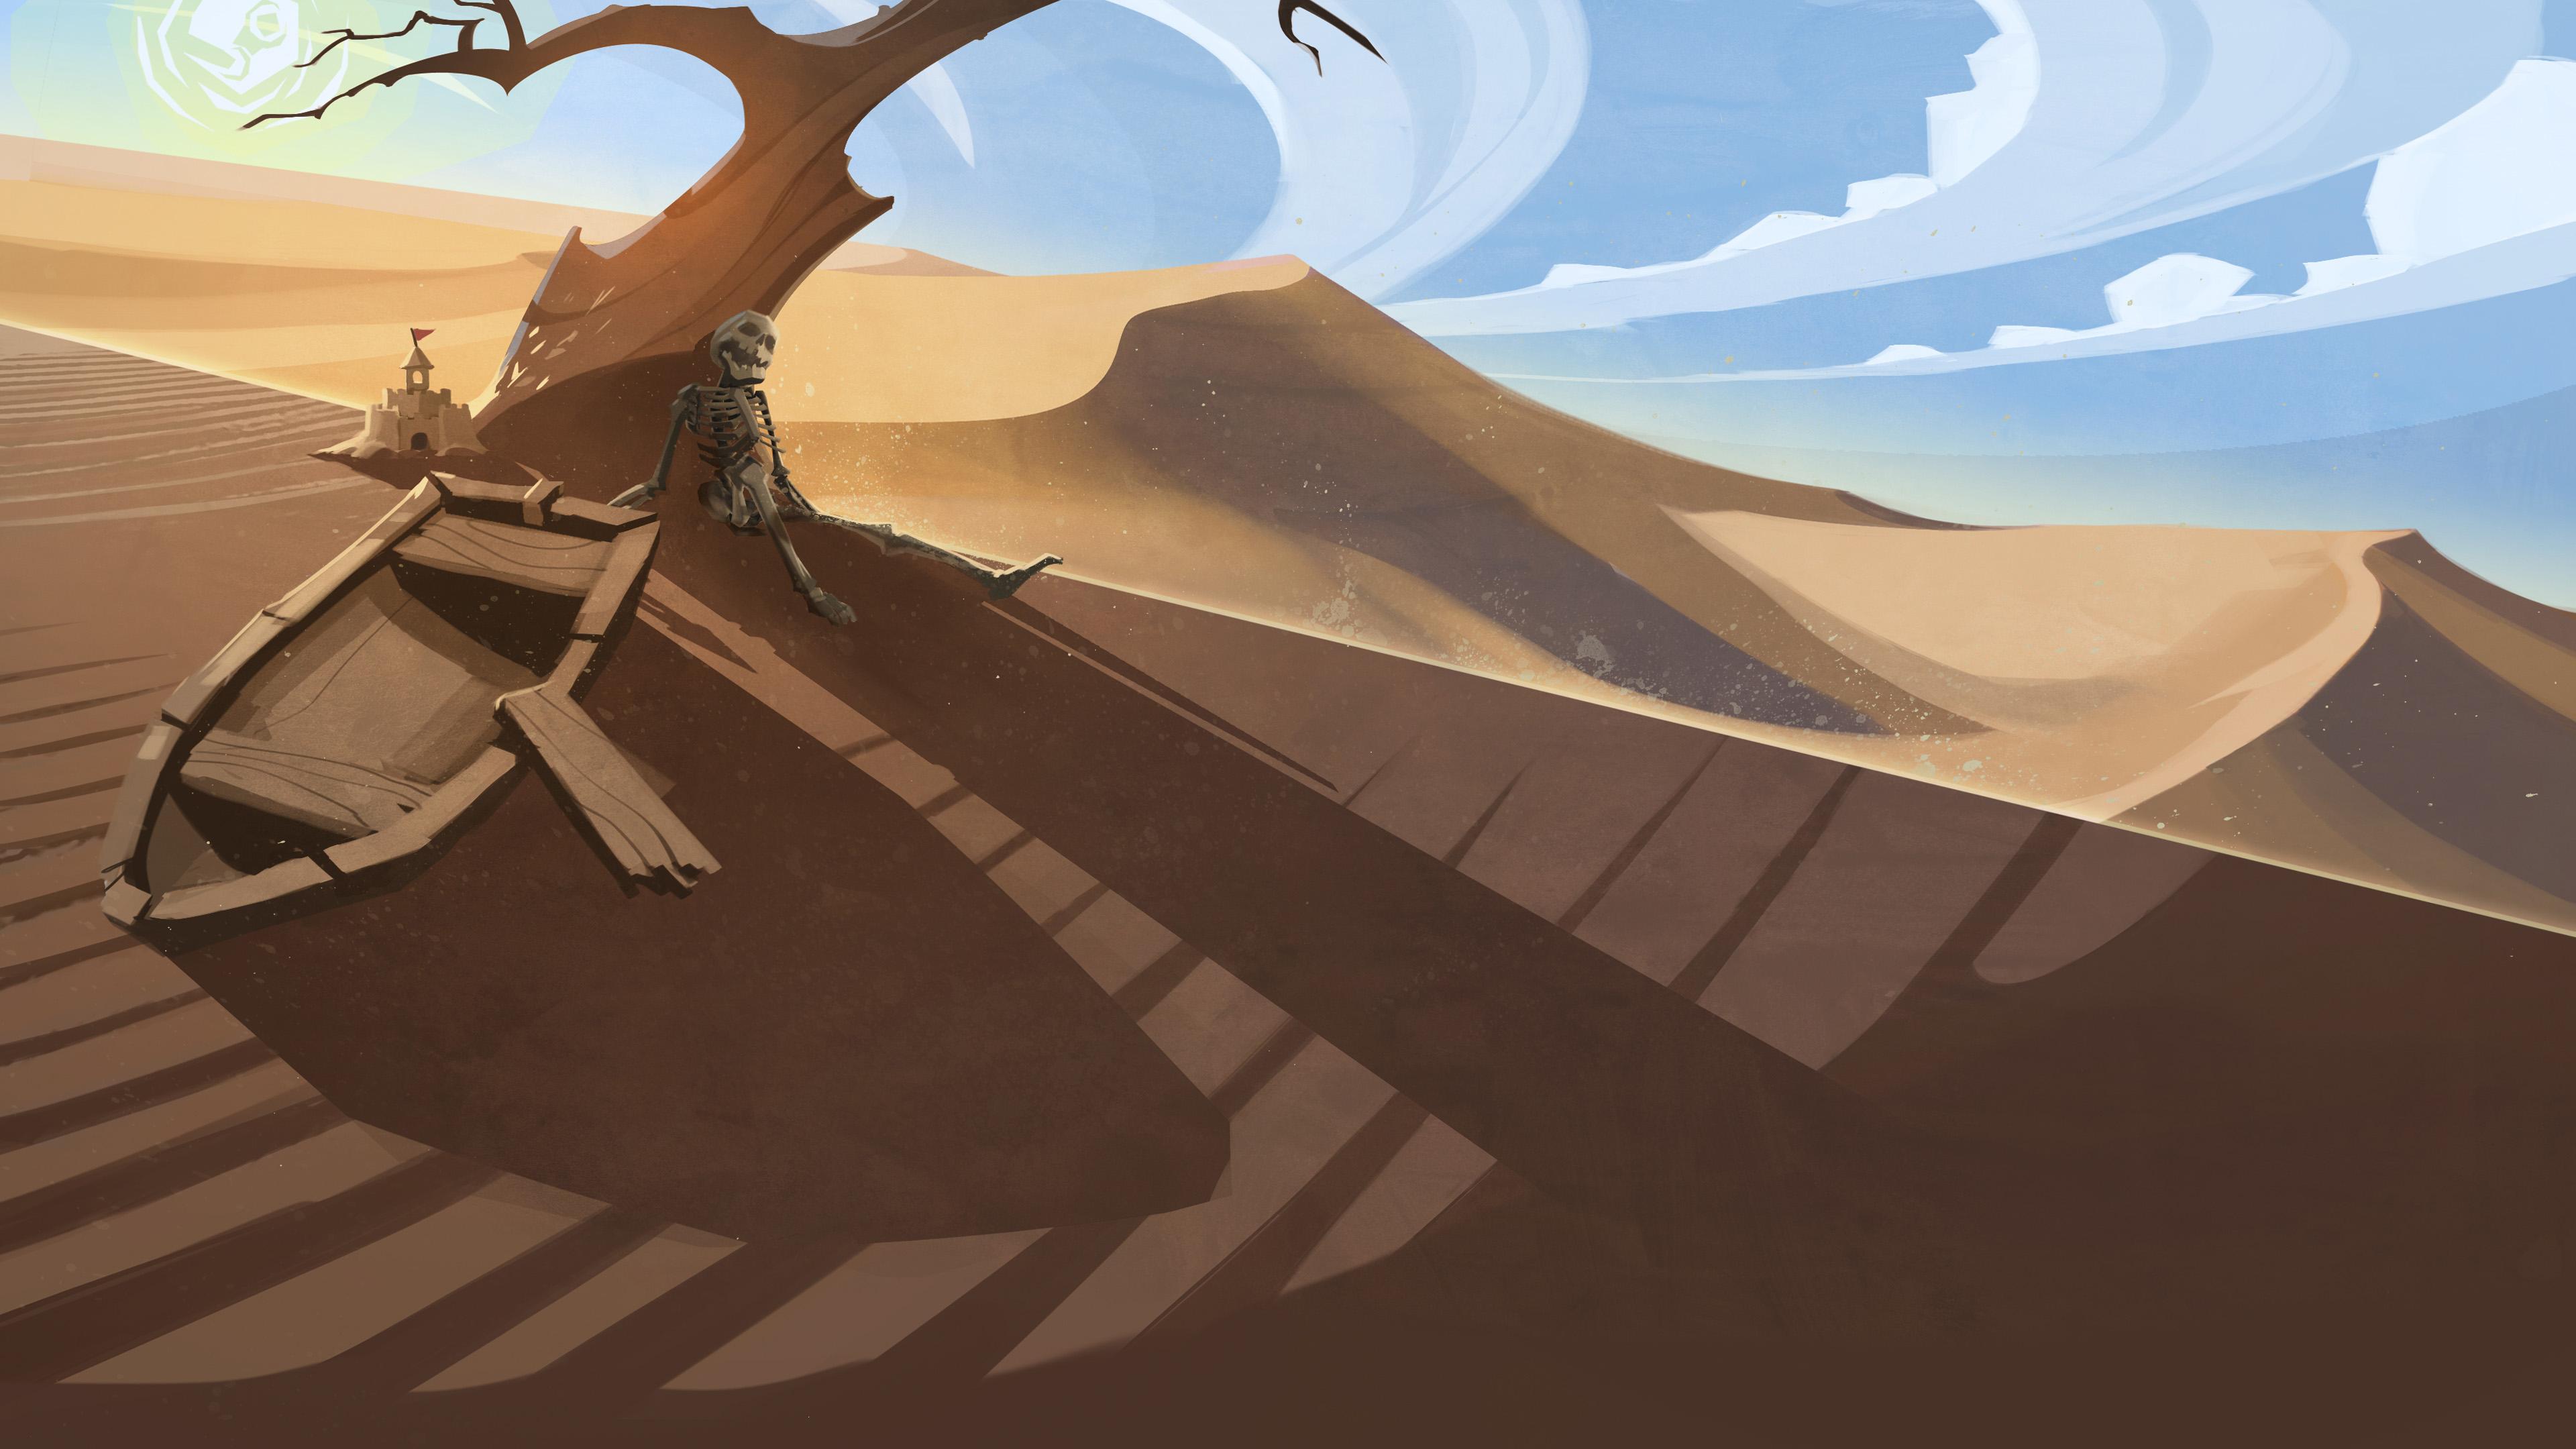 survivor desert wallpapers - photo #8